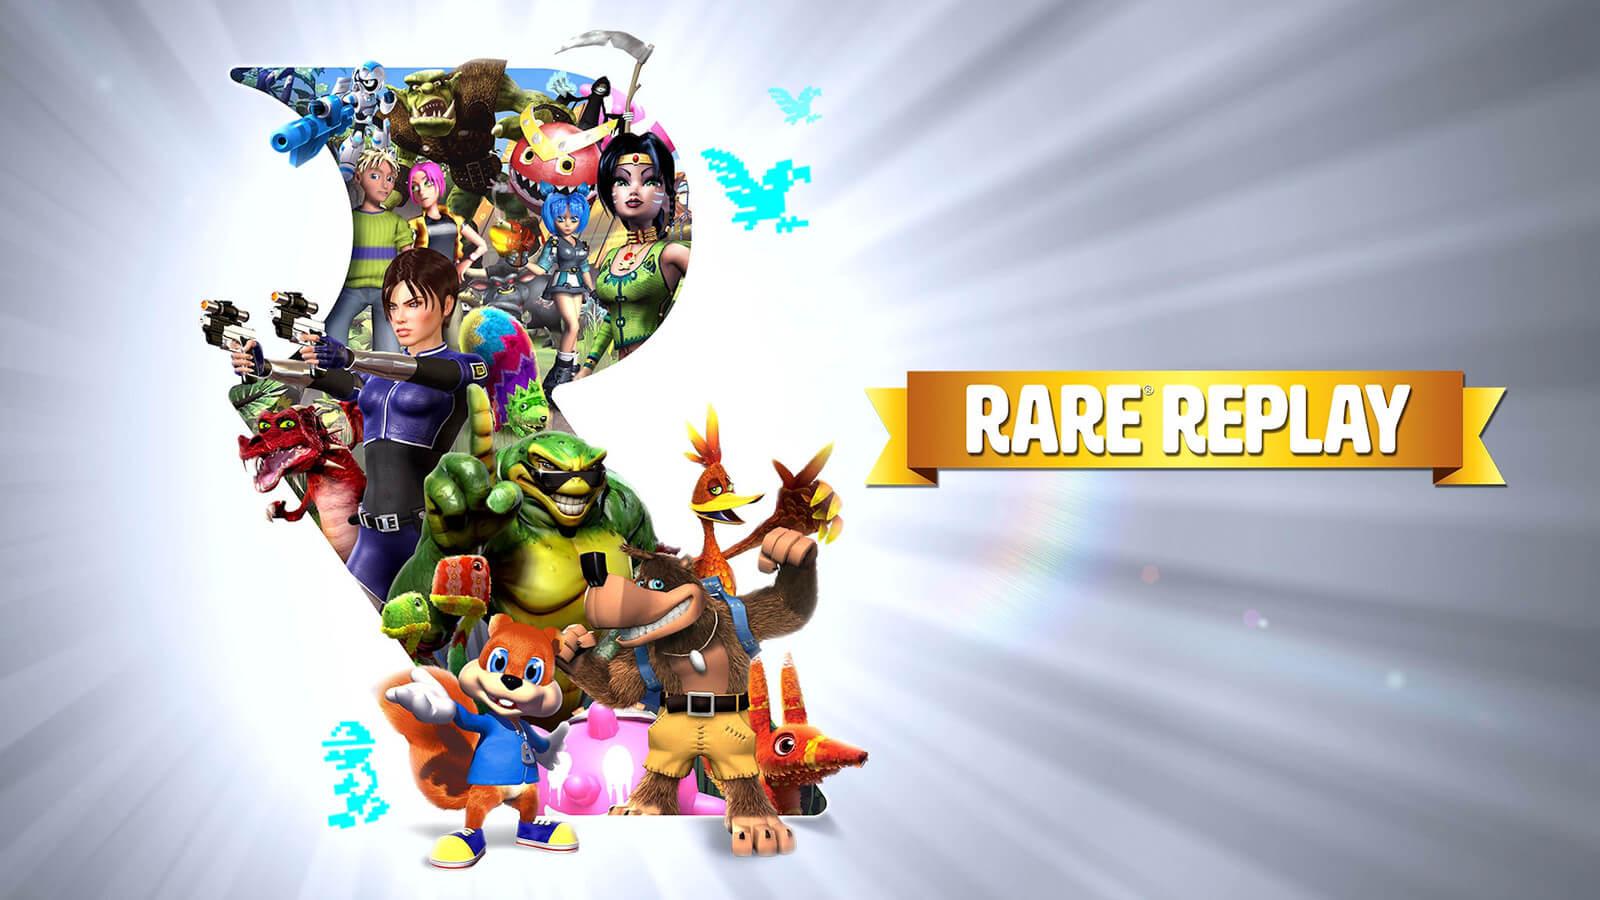 Xbox One brindes, Rare Replay, Delfos